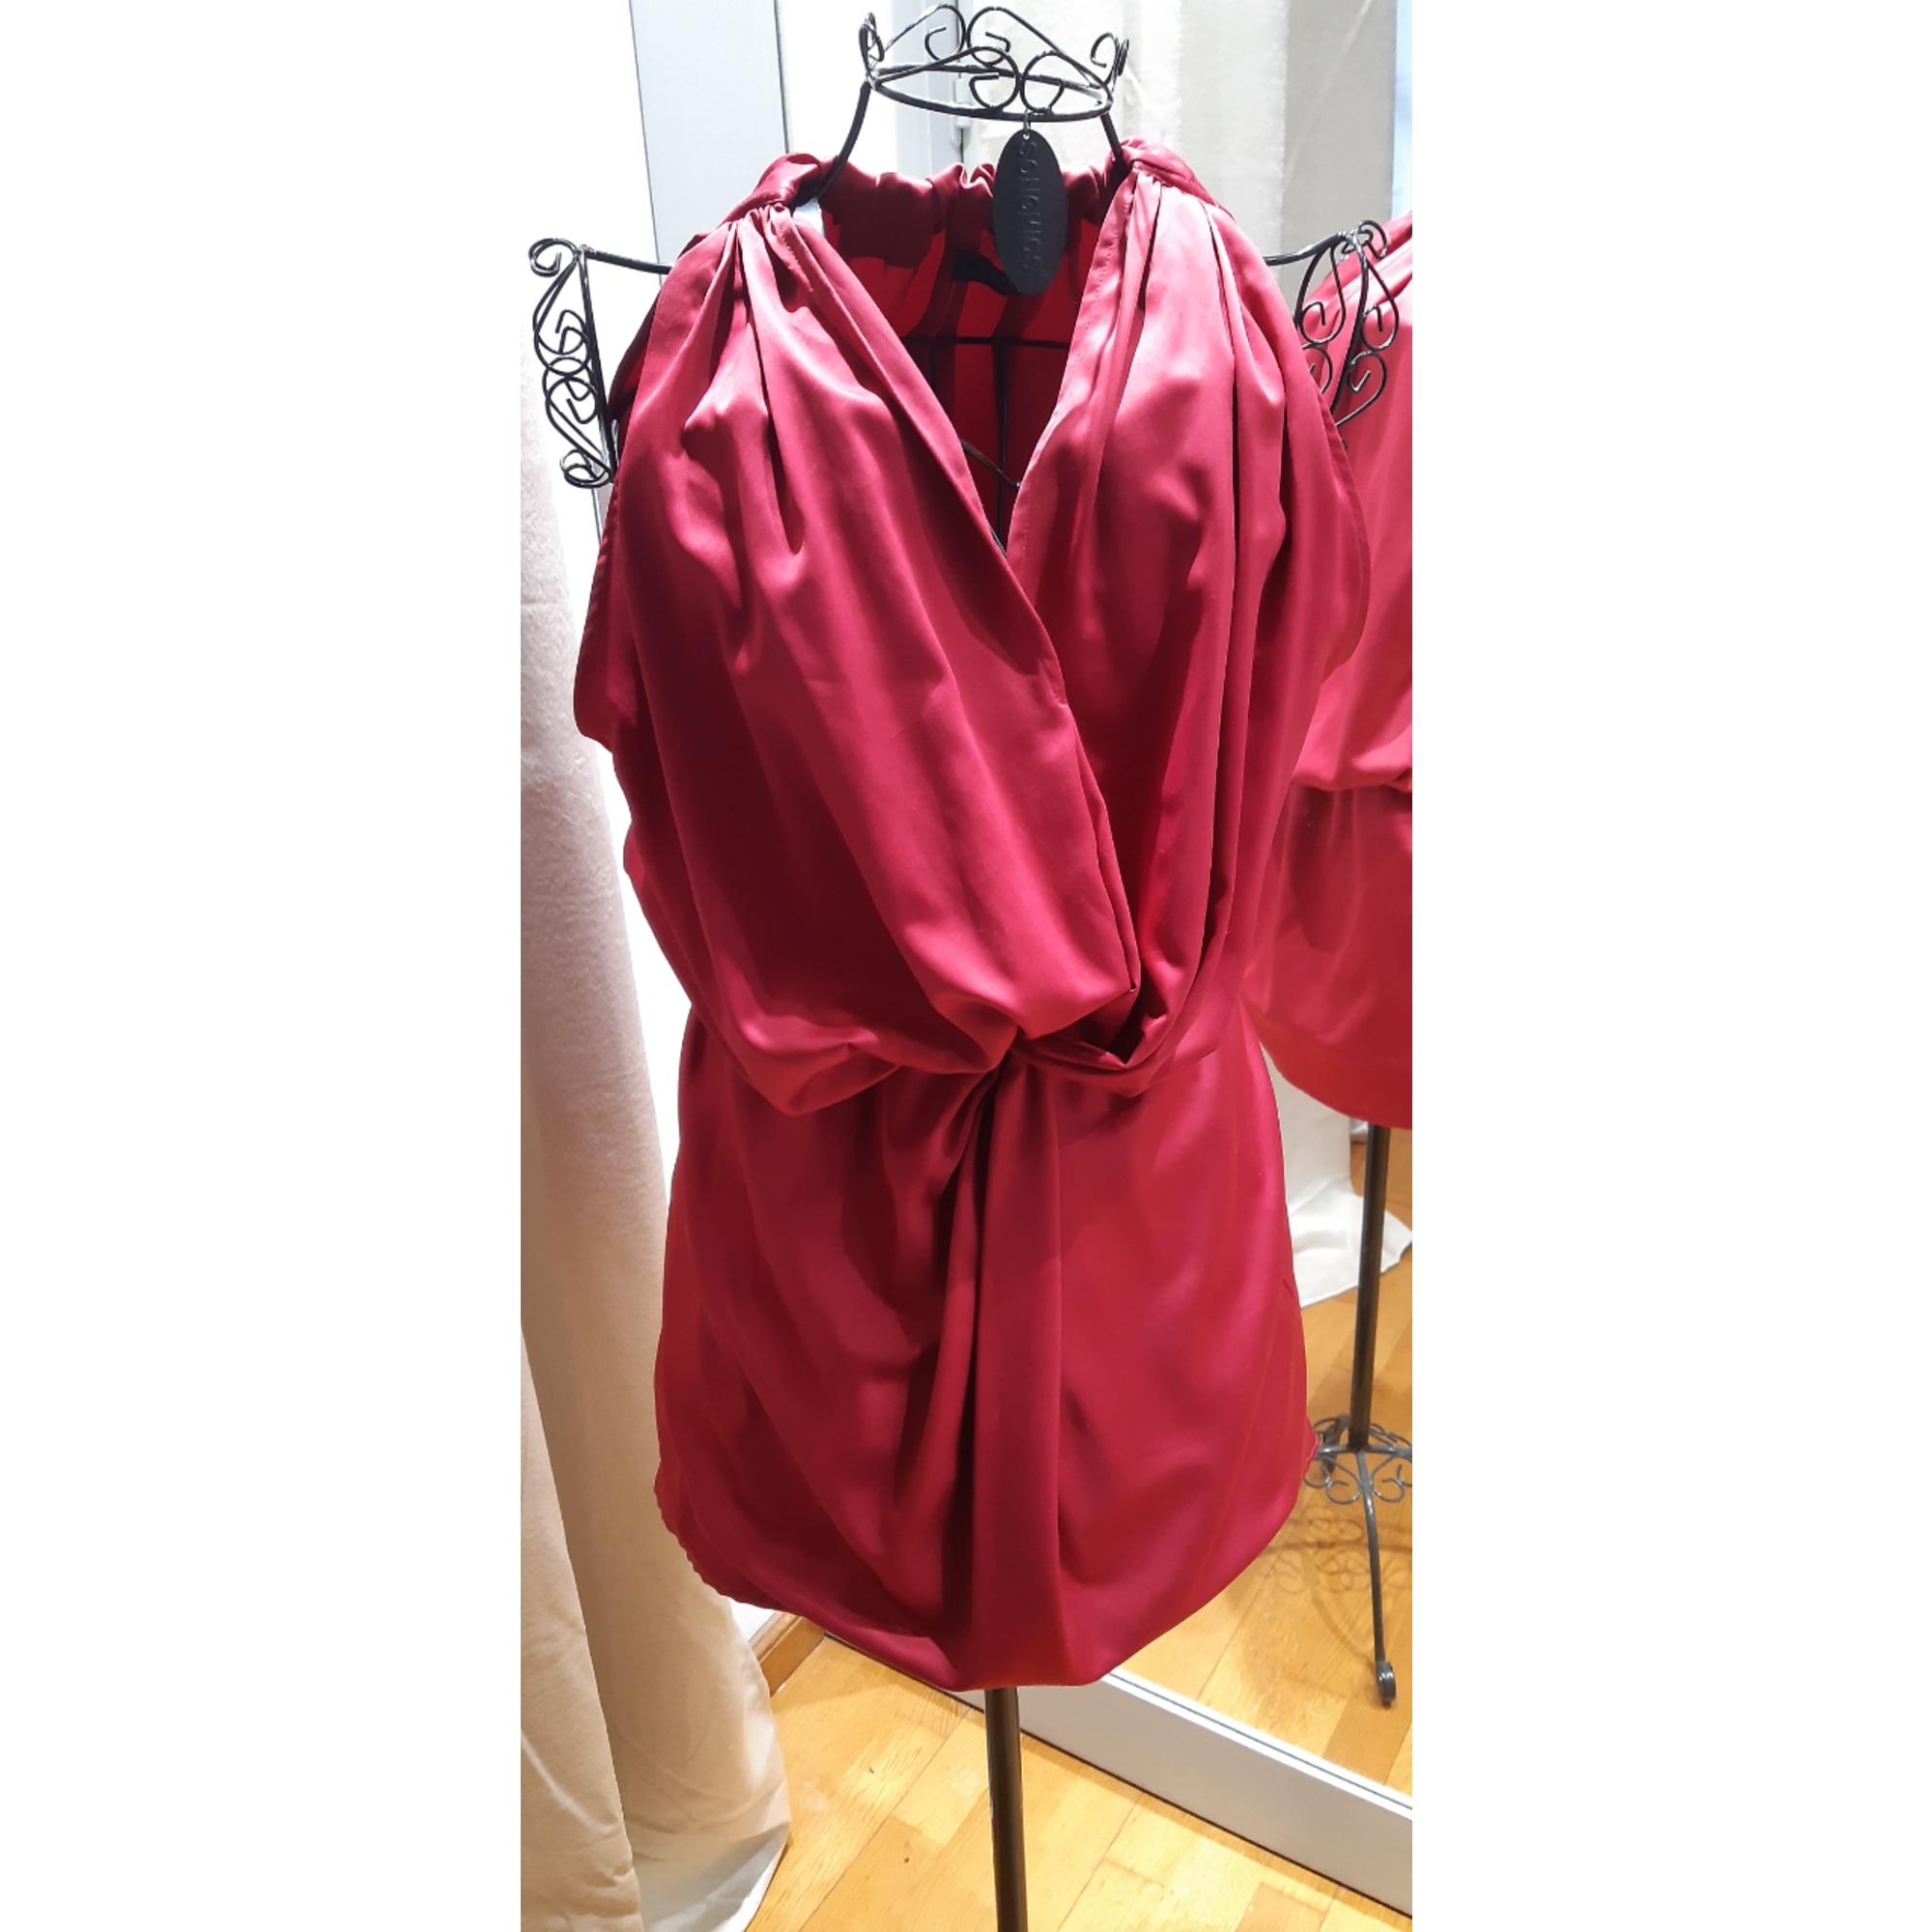 Robe courte LUI JO Rose, fuschia, vieux rose